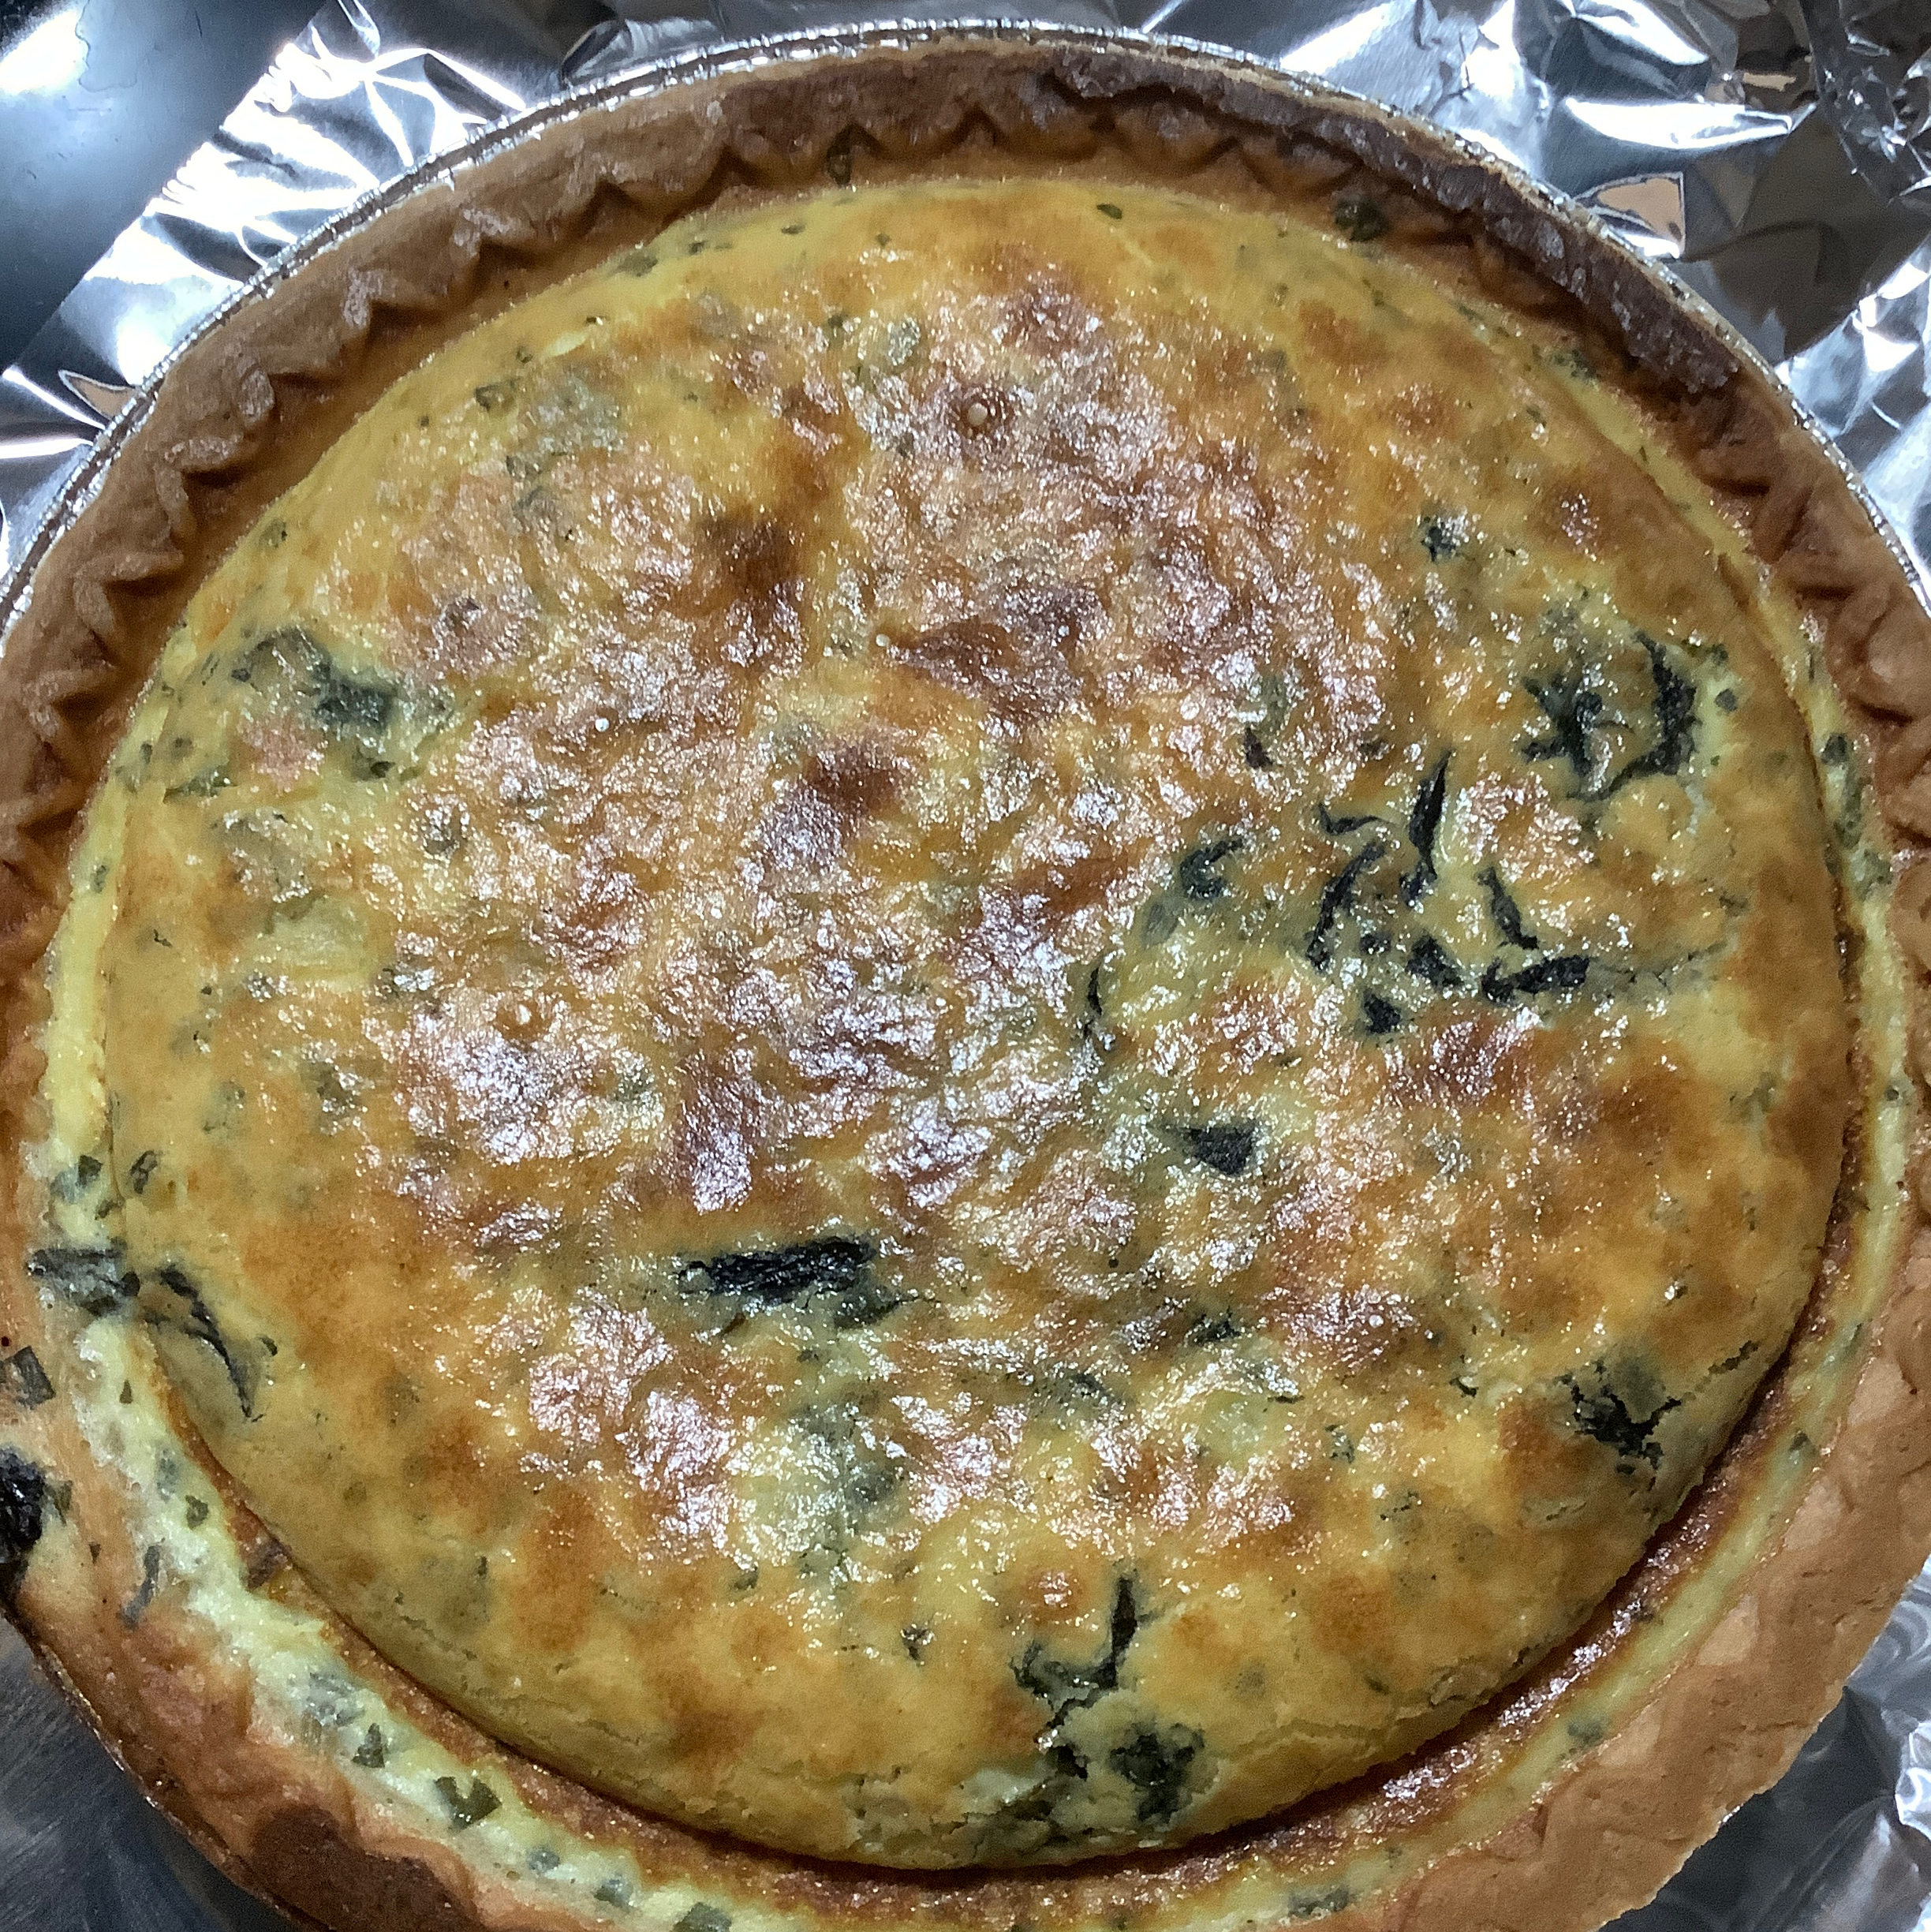 Spinach-Ricotta Quiche Misty LilDevil Laning